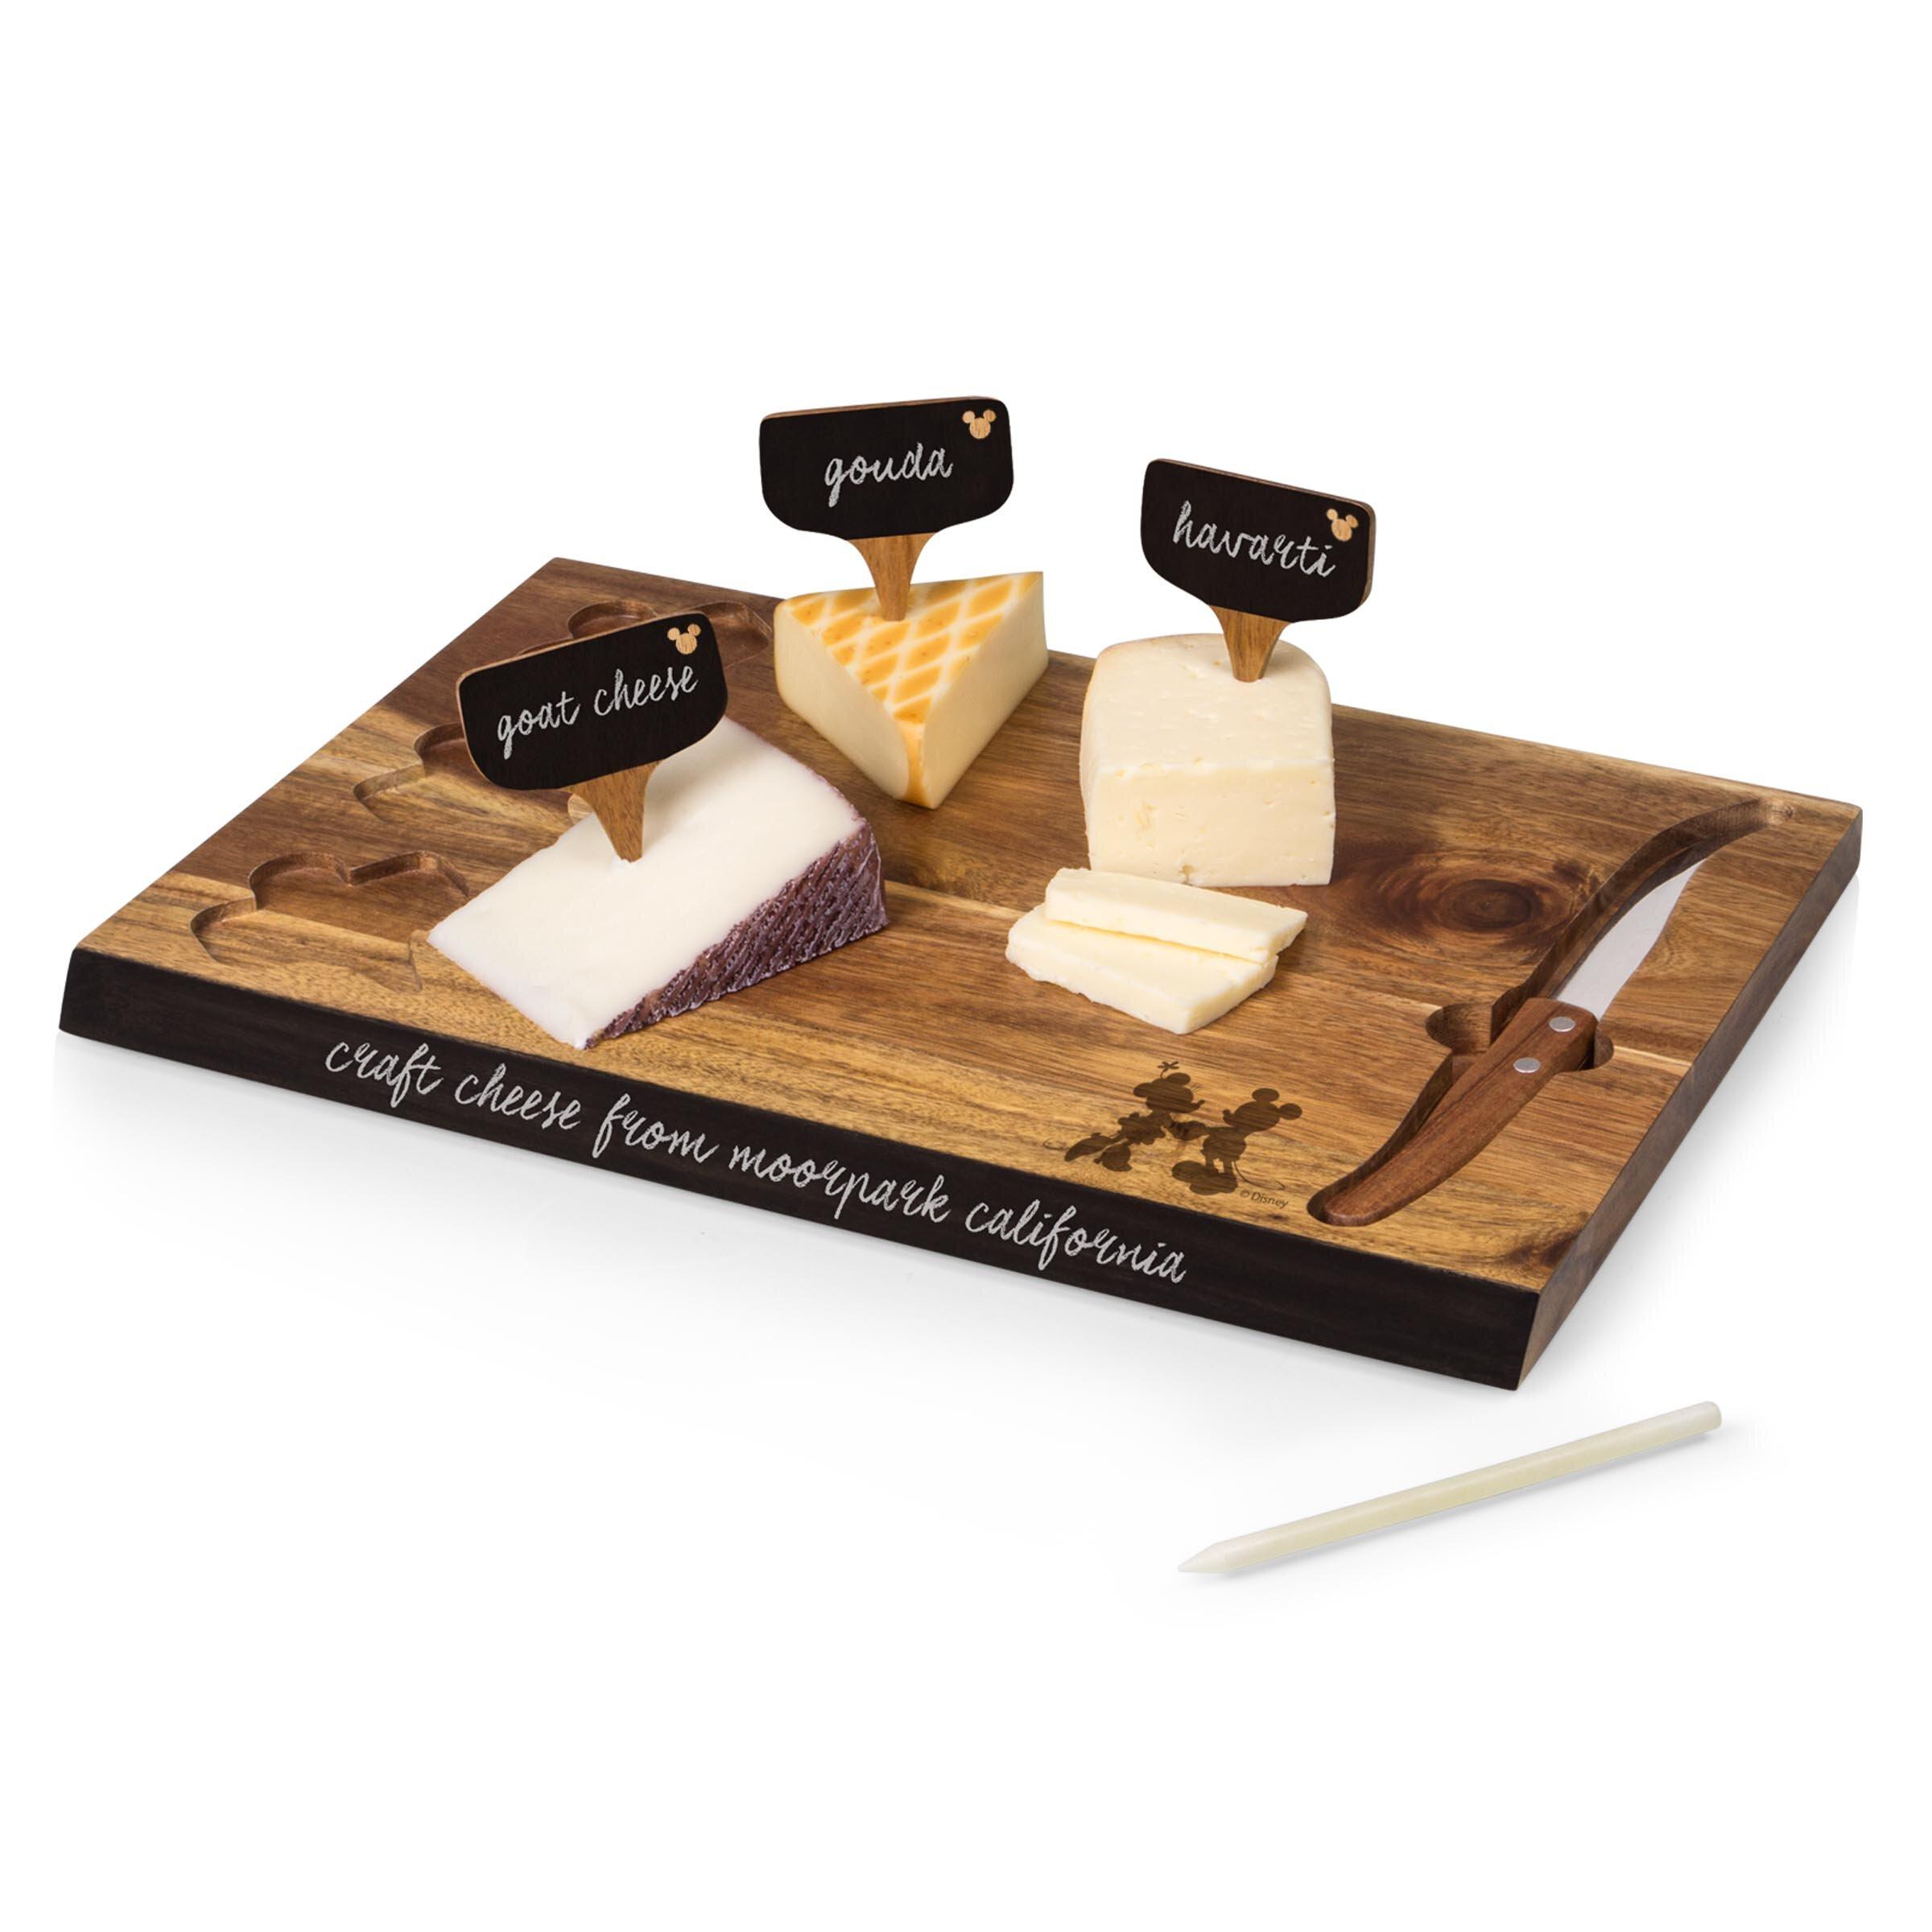 Medium Wood Cheese Boards You Ll Love In 2021 Wayfair